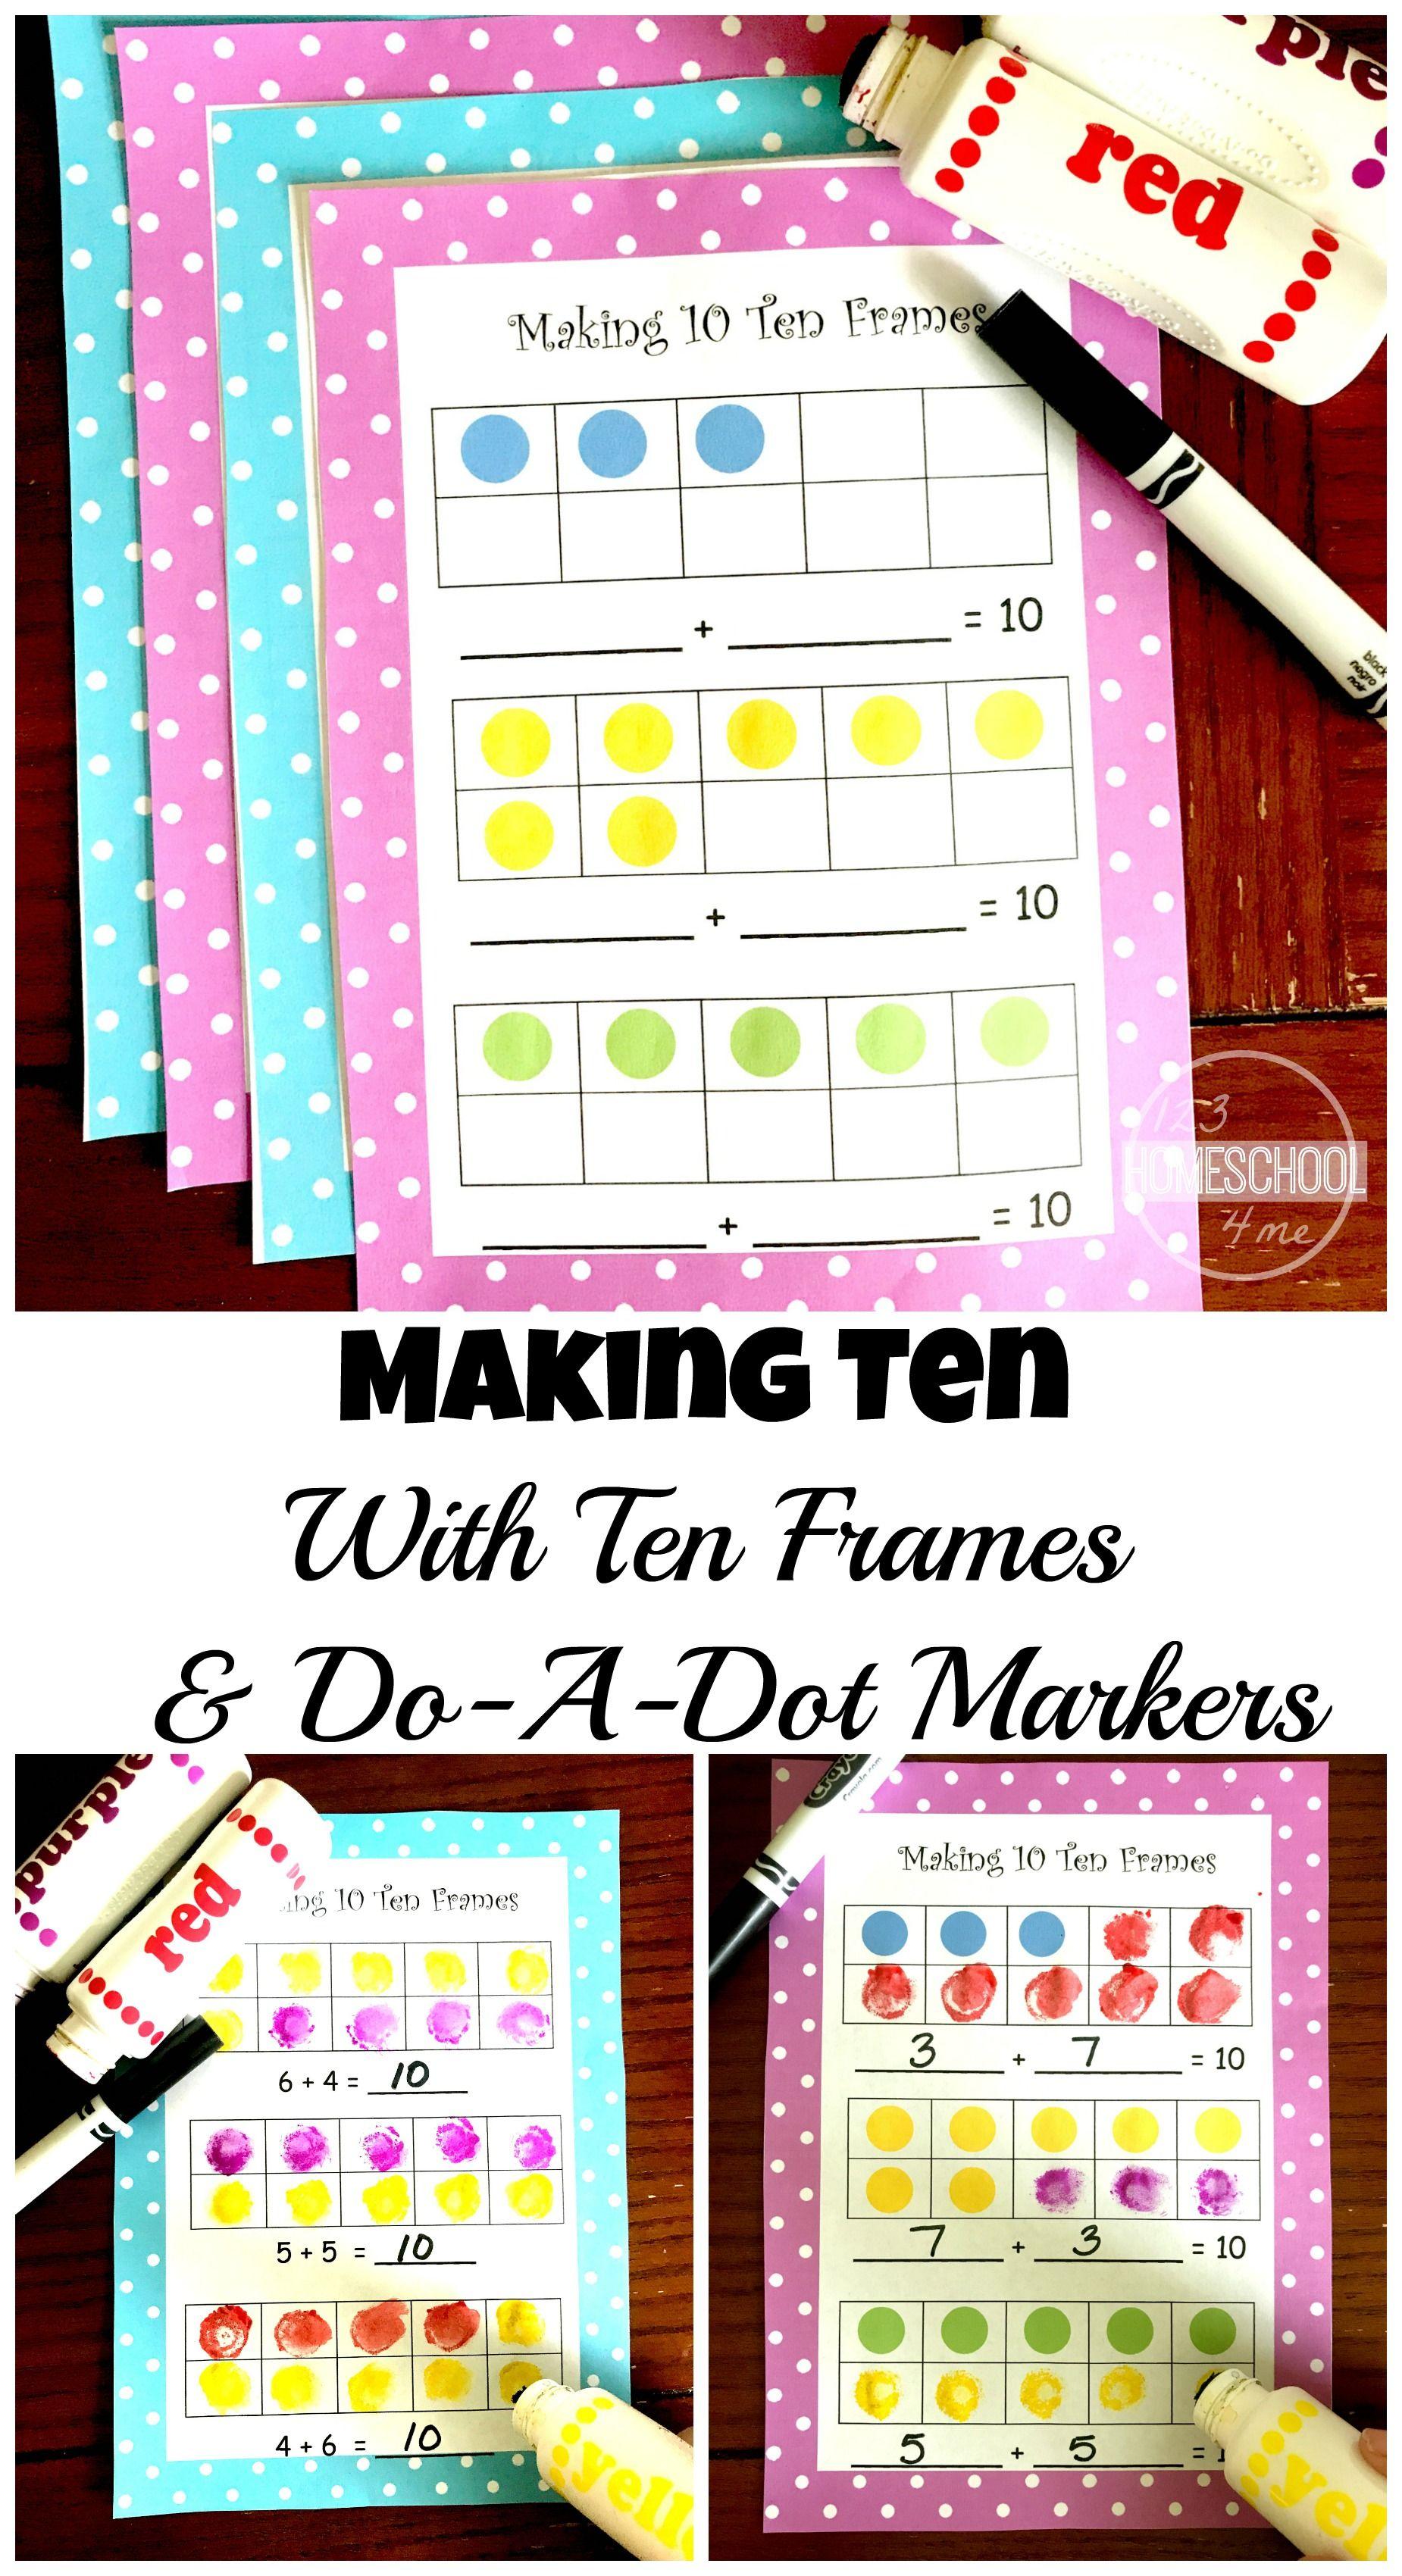 FREE Making 10 Ten Frames | Pinterest | Ten frames, Worksheets and ...